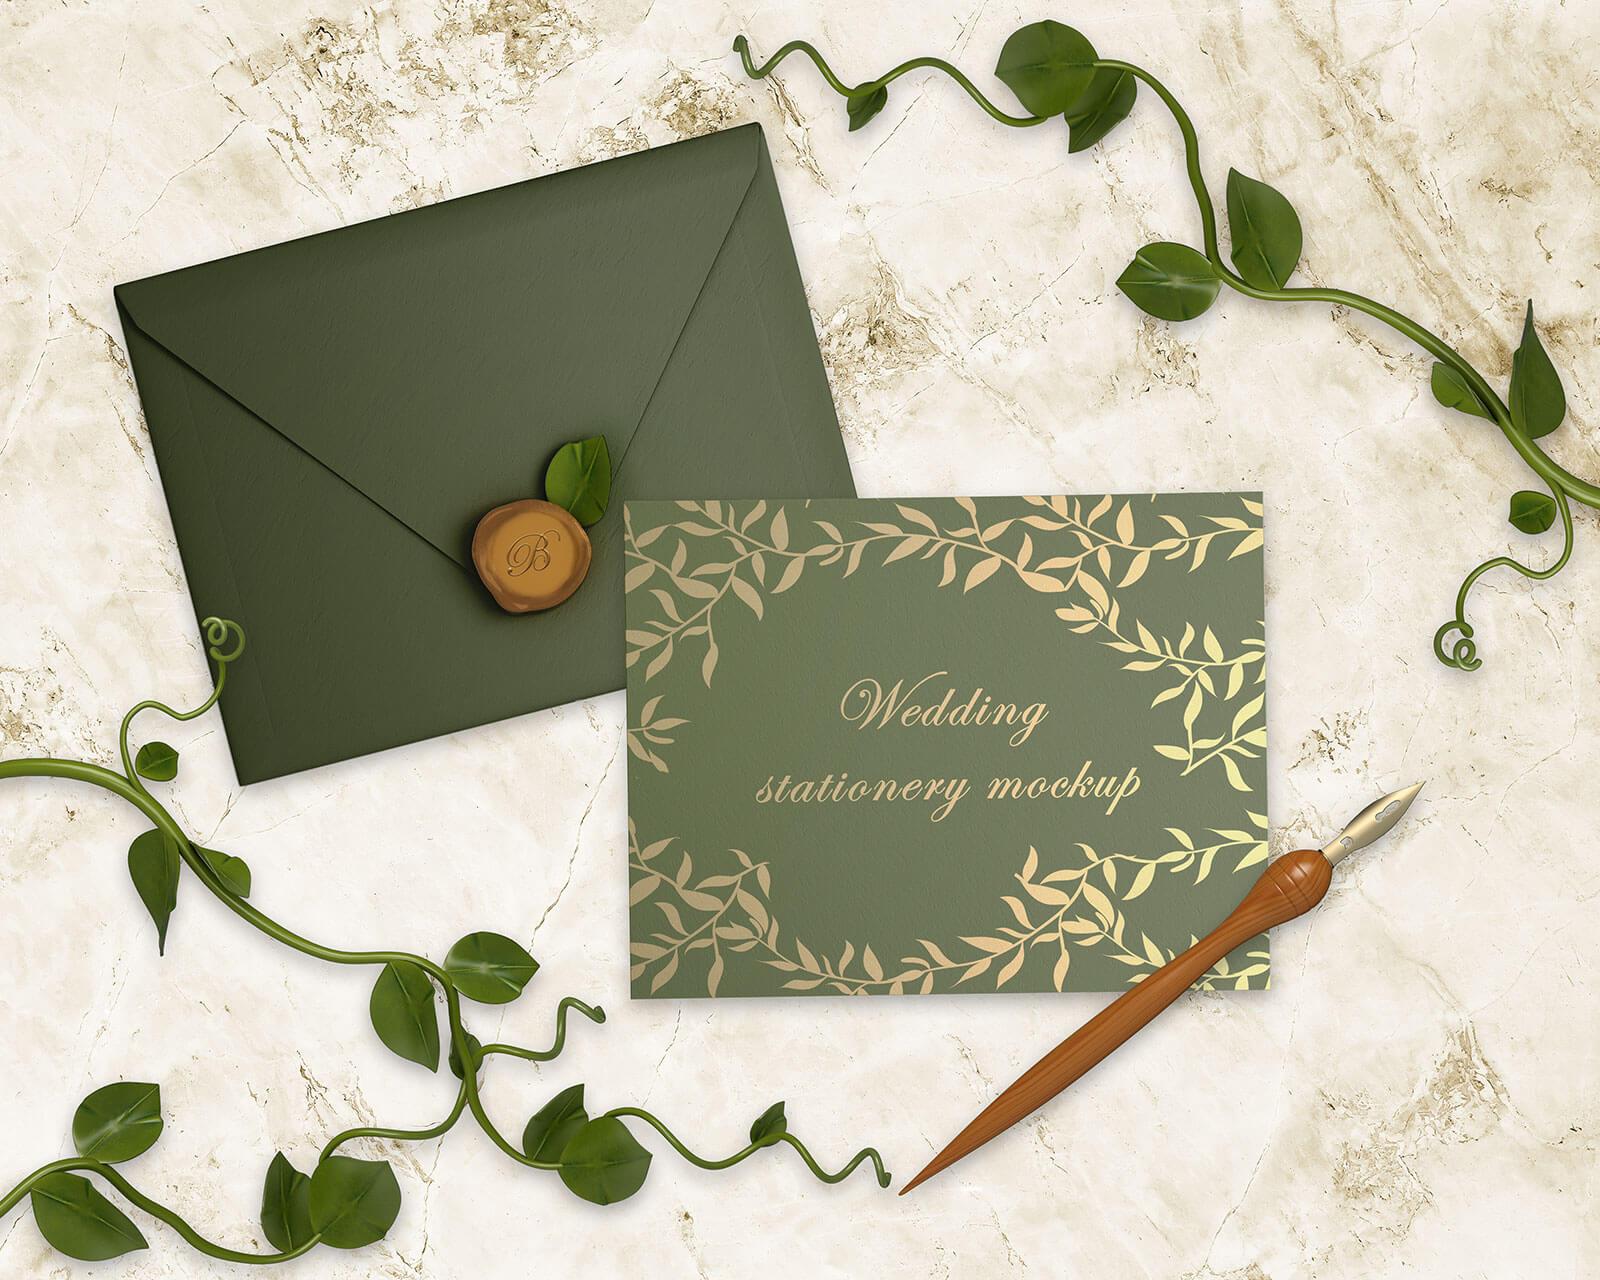 Free Wedding Invitation Card & Envelope Mockup PSD Set - Good Mockups